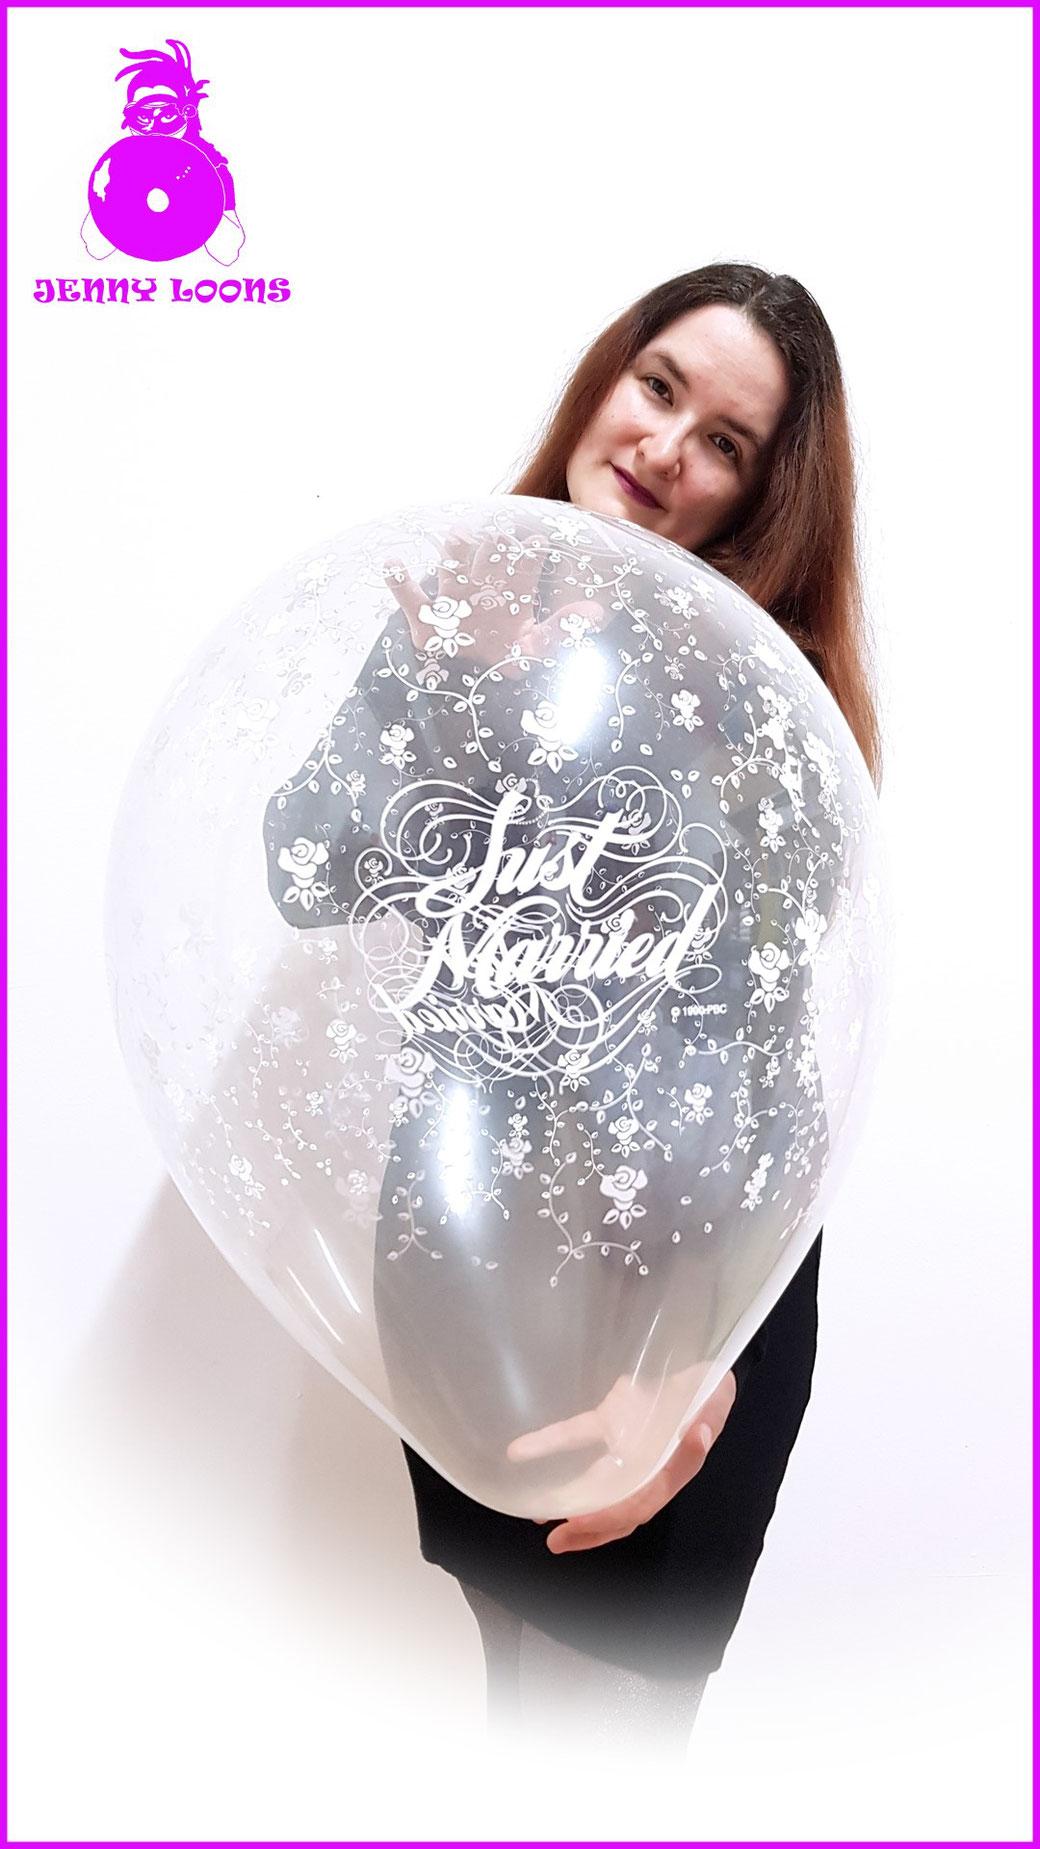 Qualatex Luftballon Ballon Hochzeit Marriage 16inch 40cm love wedding klar clear just married Balloon Balloons